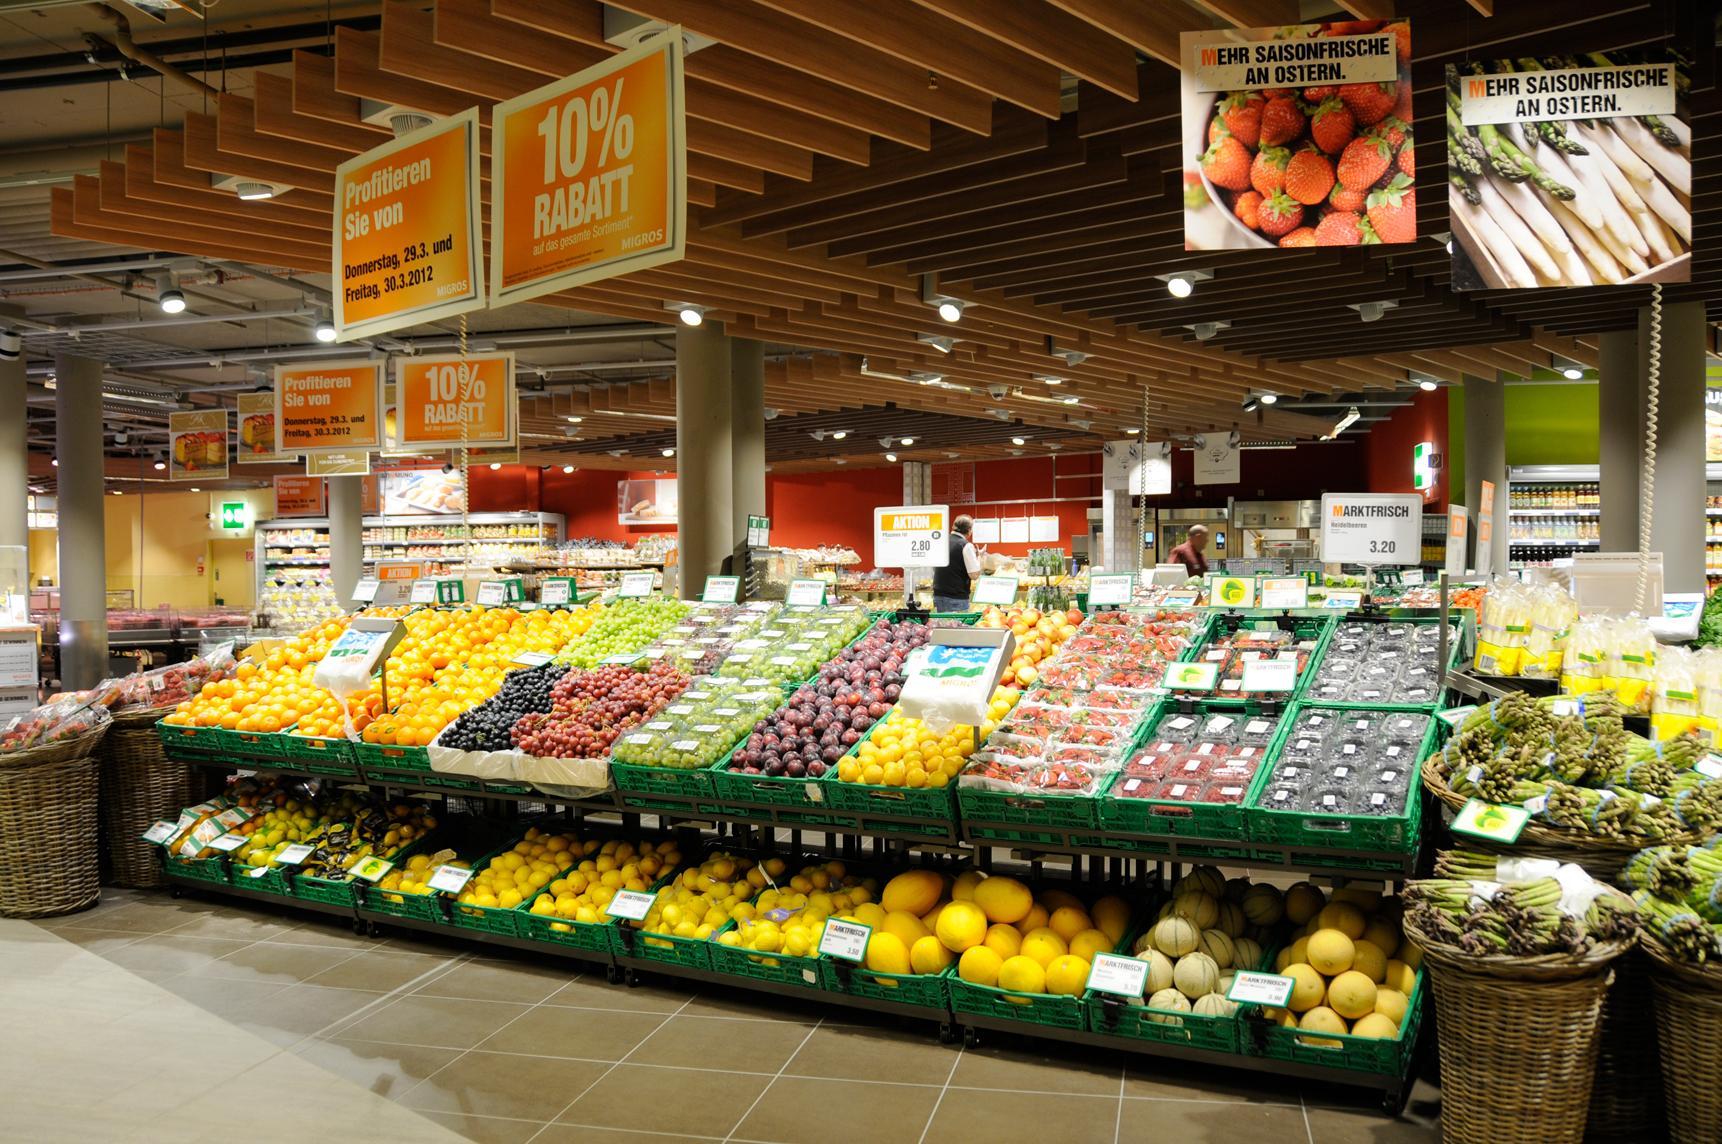 Фото супермаркета Migros в Анталии